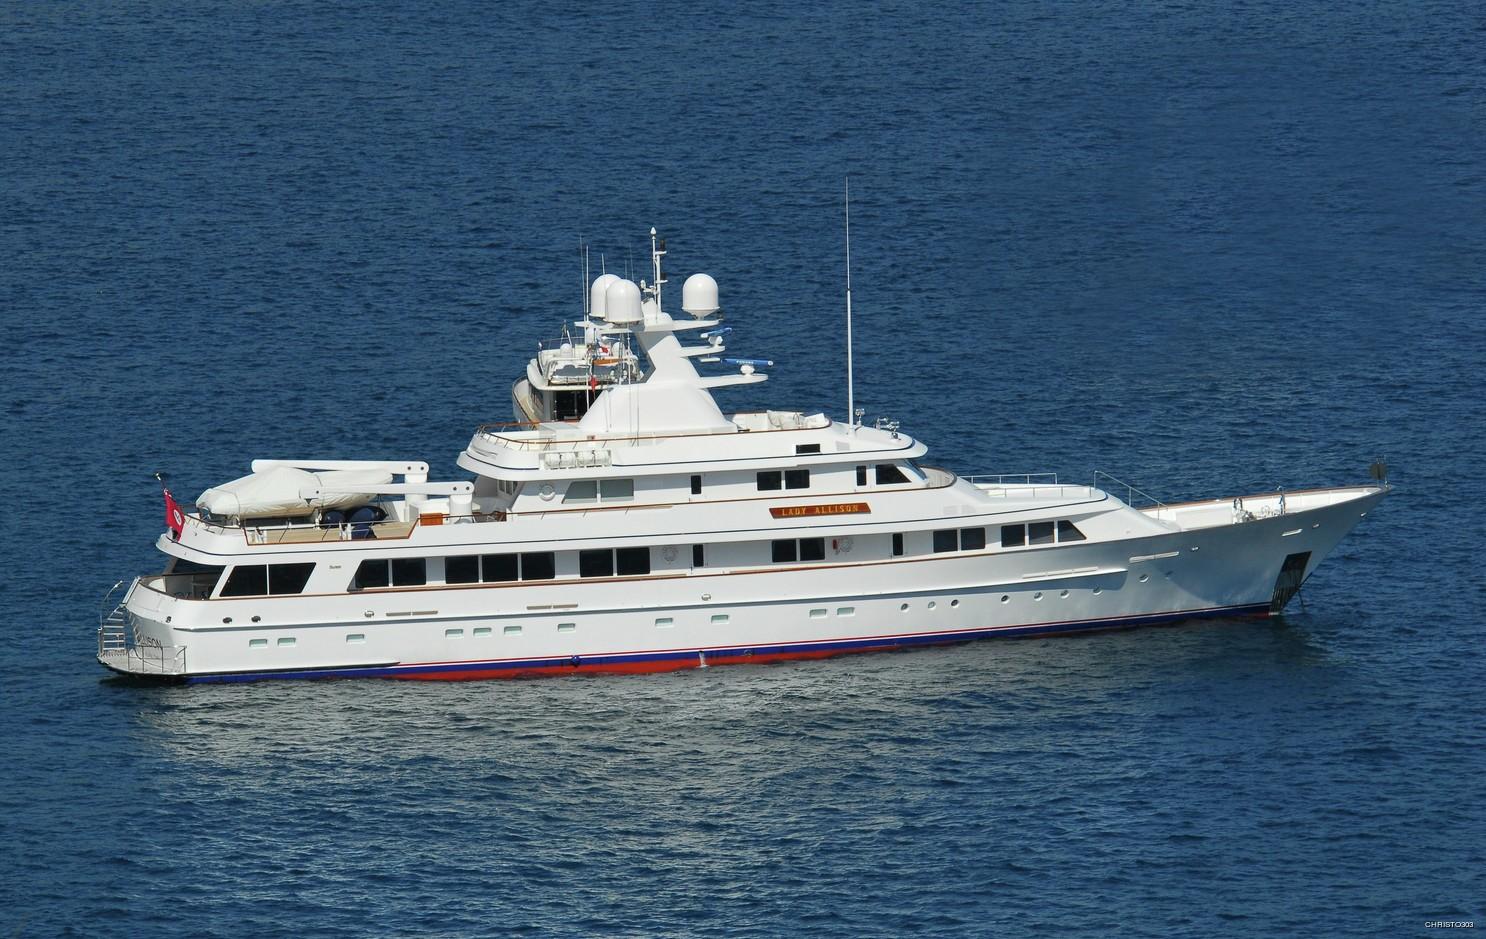 Yacht ENDLESS SUMMER Feadship CHARTERWORLD Luxury Superyacht Charters